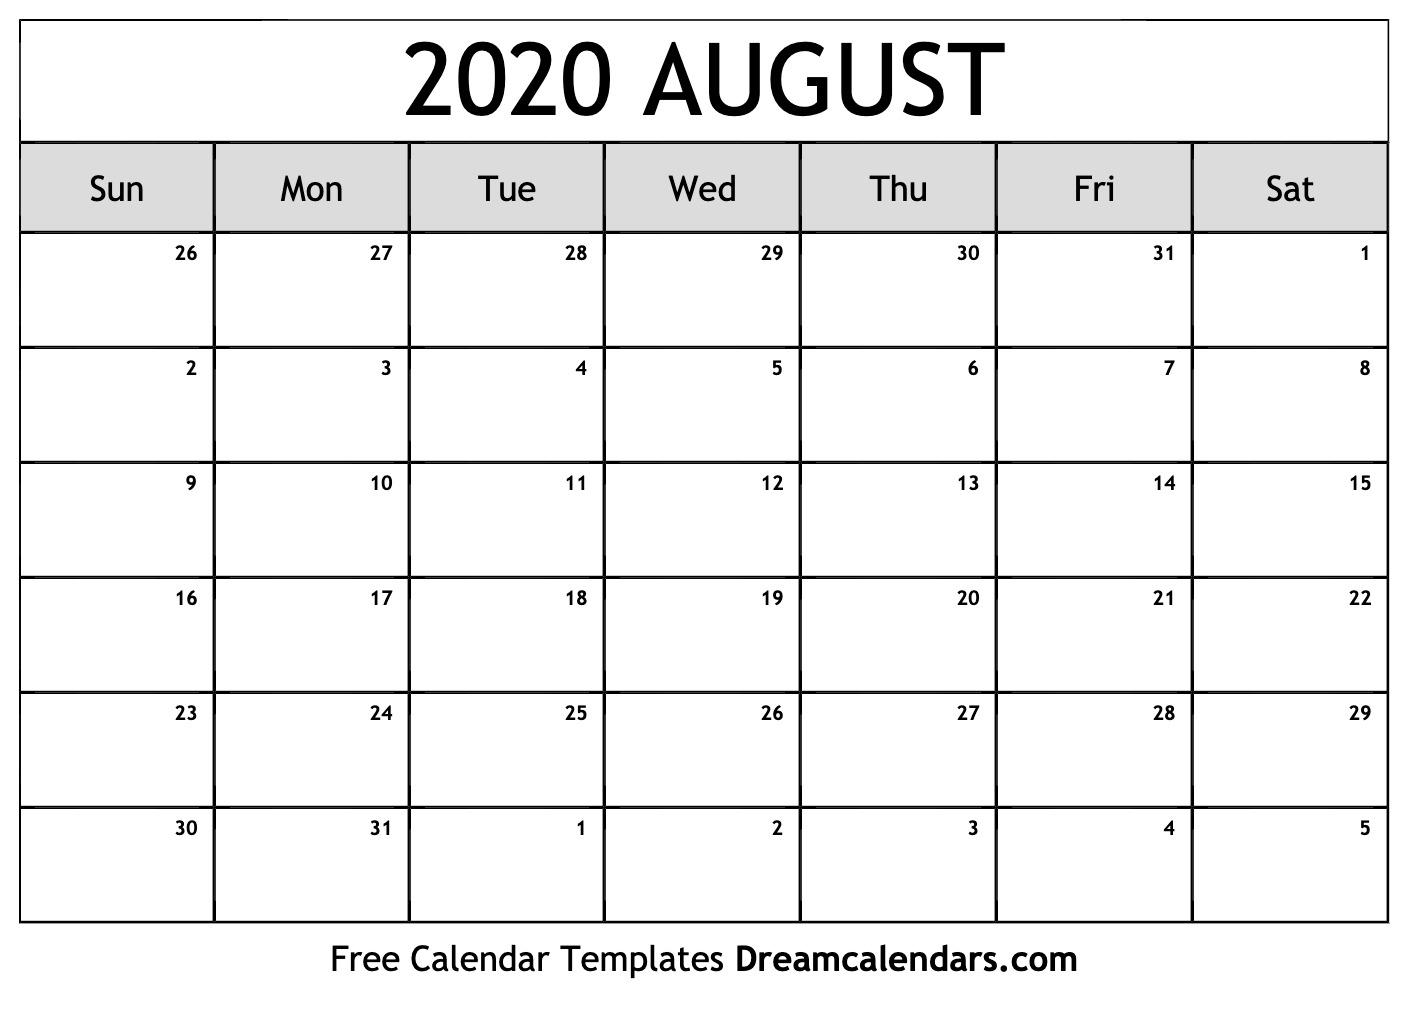 Printable August 2020 Calendar with regard to Kid Freiendly August 2020 Calendars